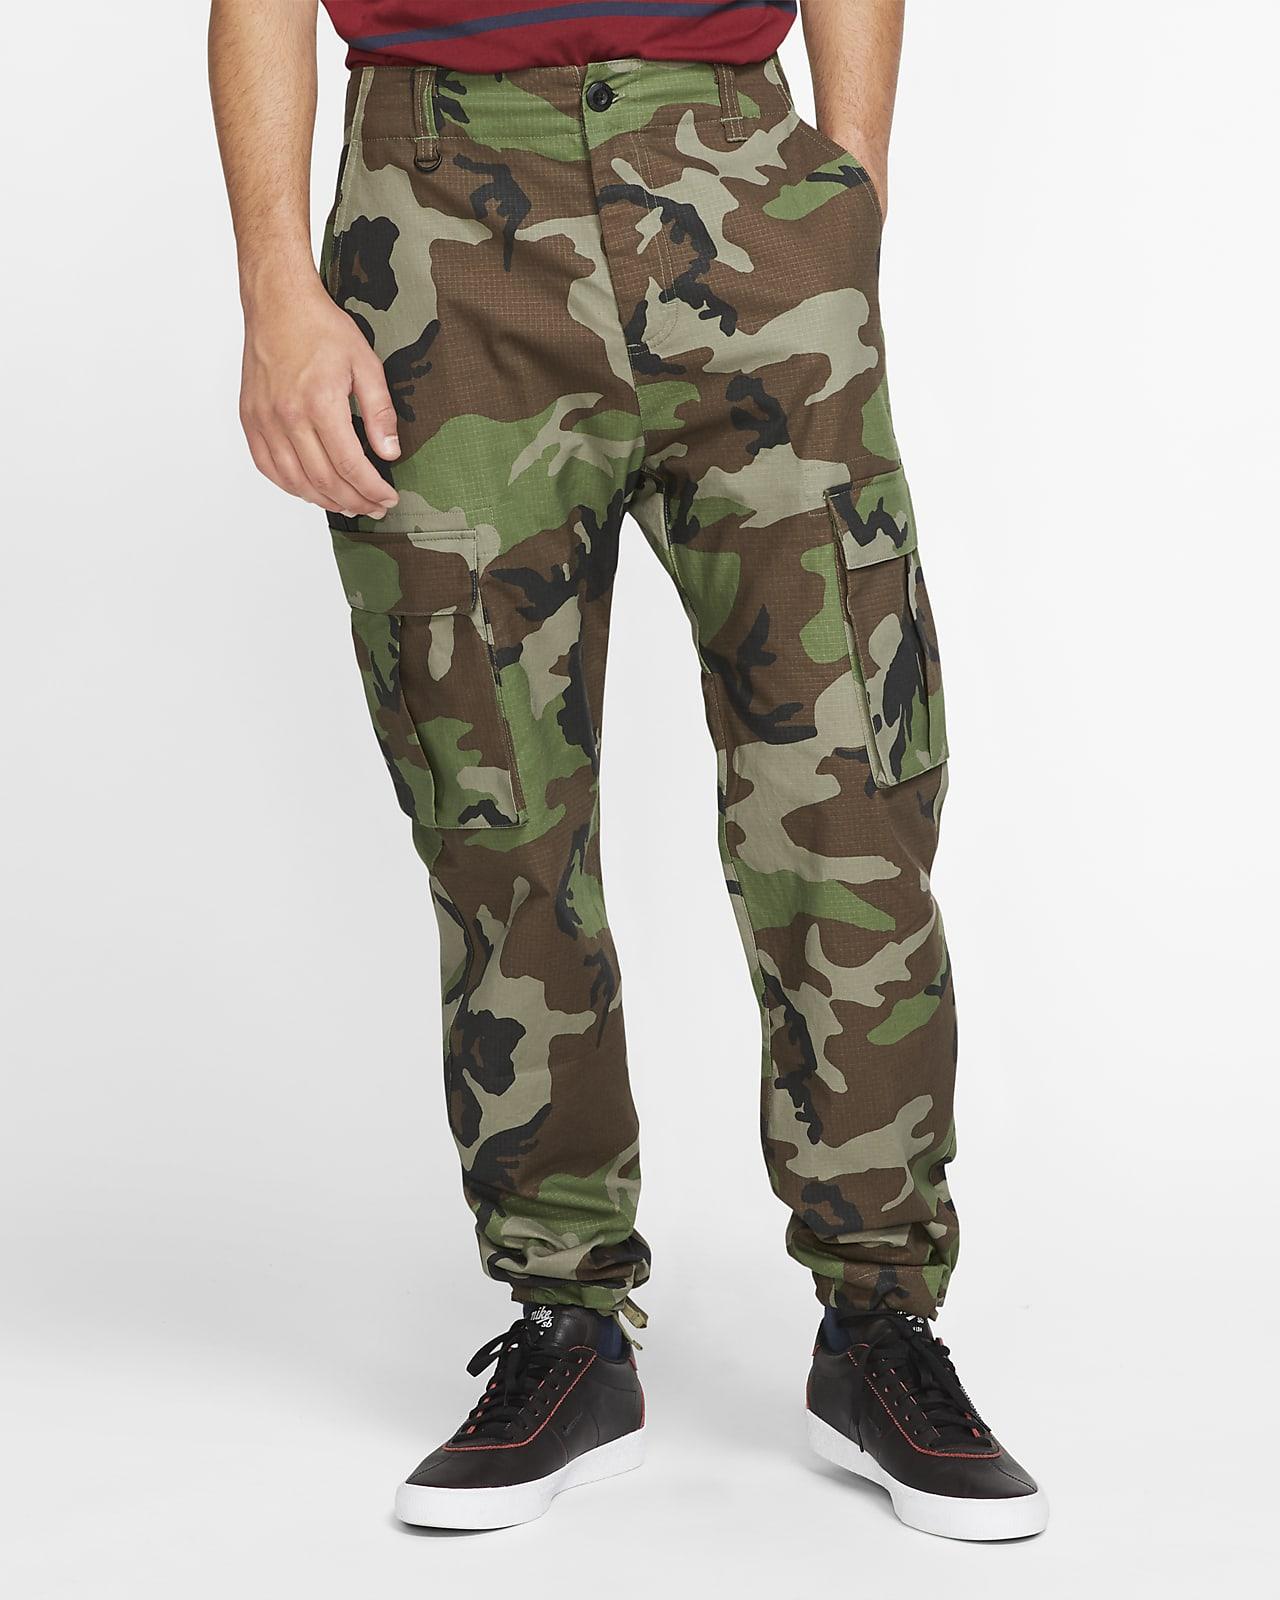 Pantalon cargo de skateboard motif camouflage Nike SB Flex FTM pour Homme